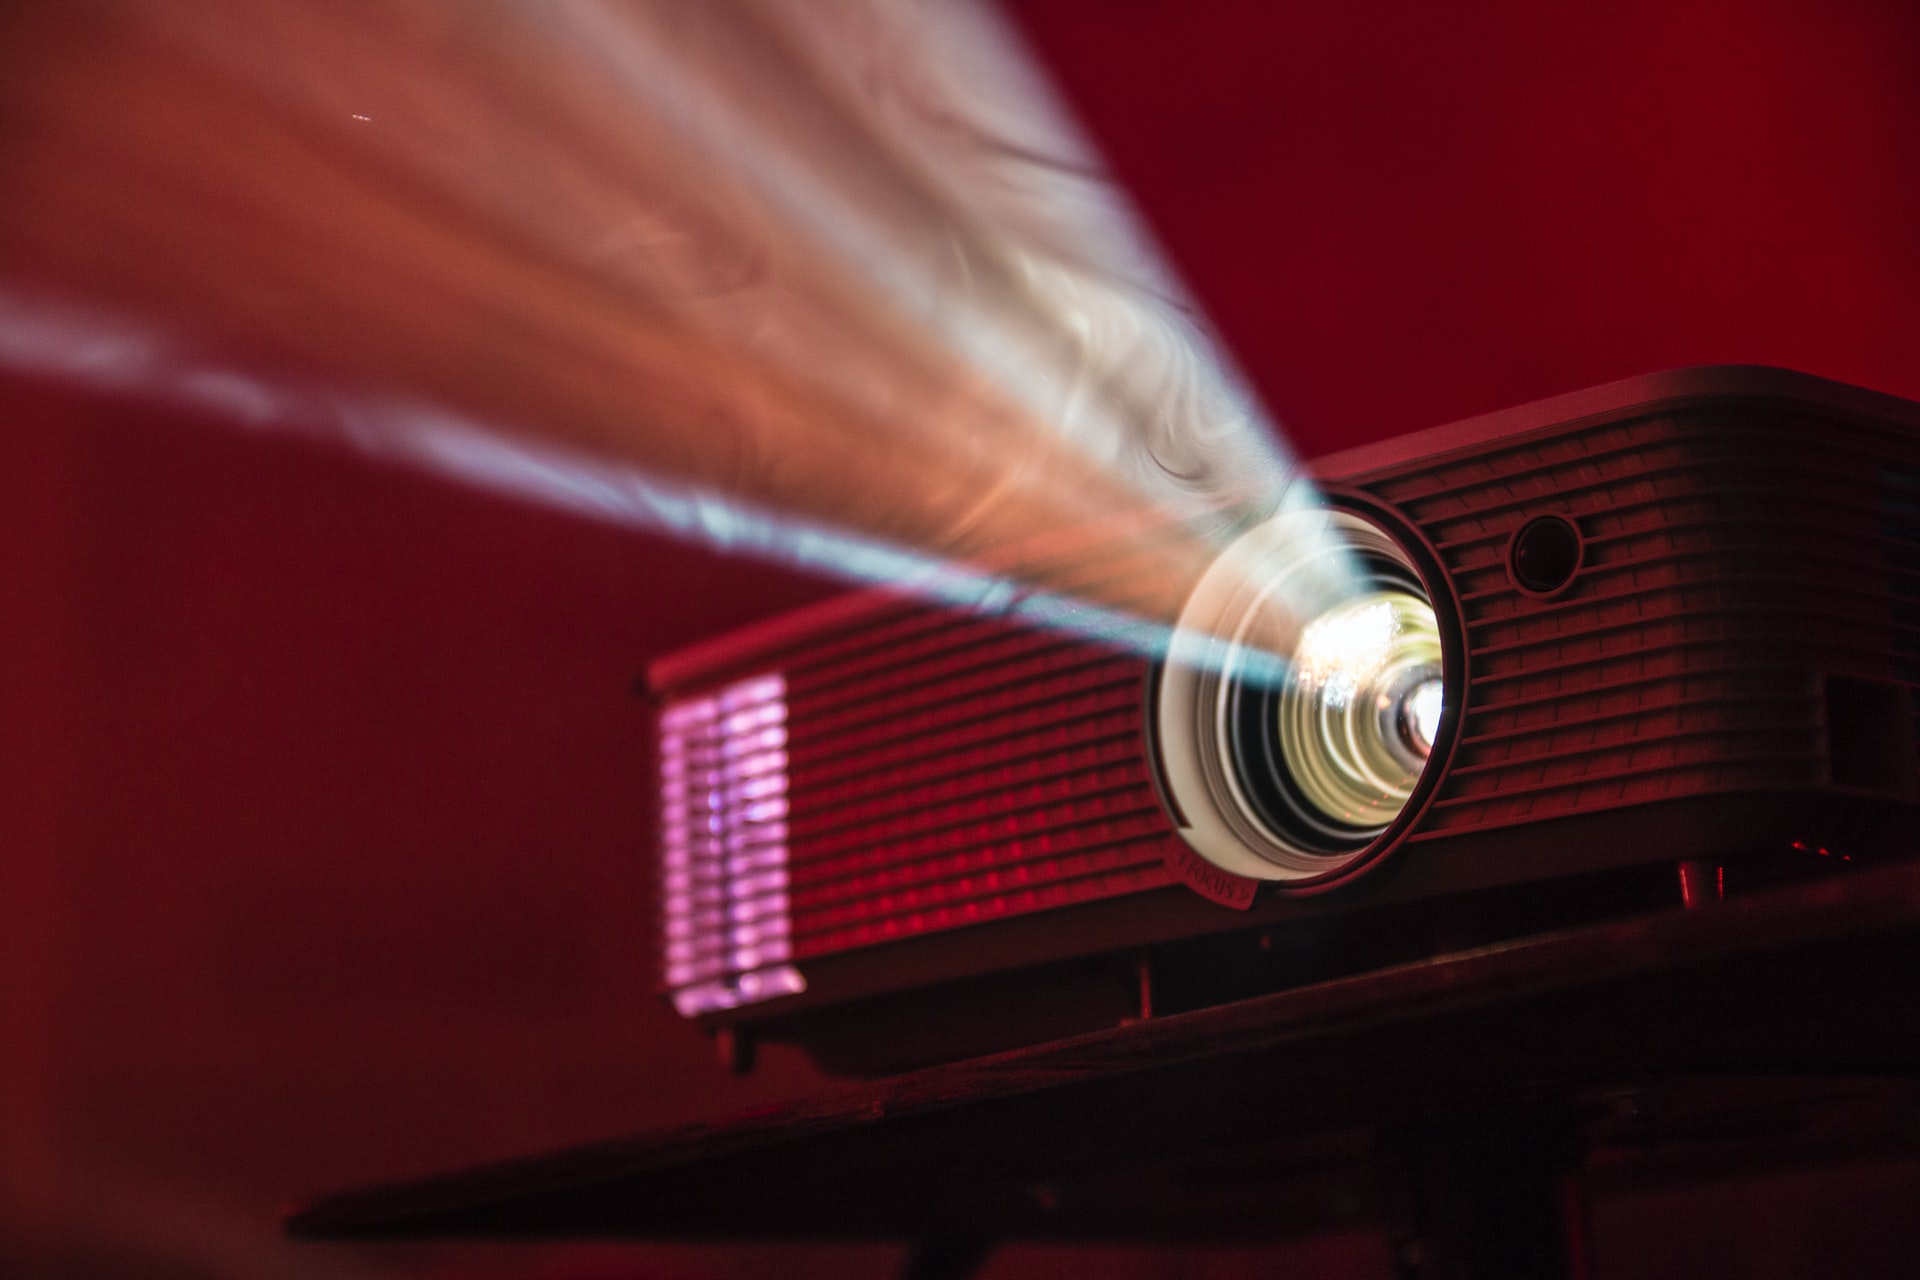 5 Kiat Ciptakan Keseruan Nonton A la Bioskop di Rumah